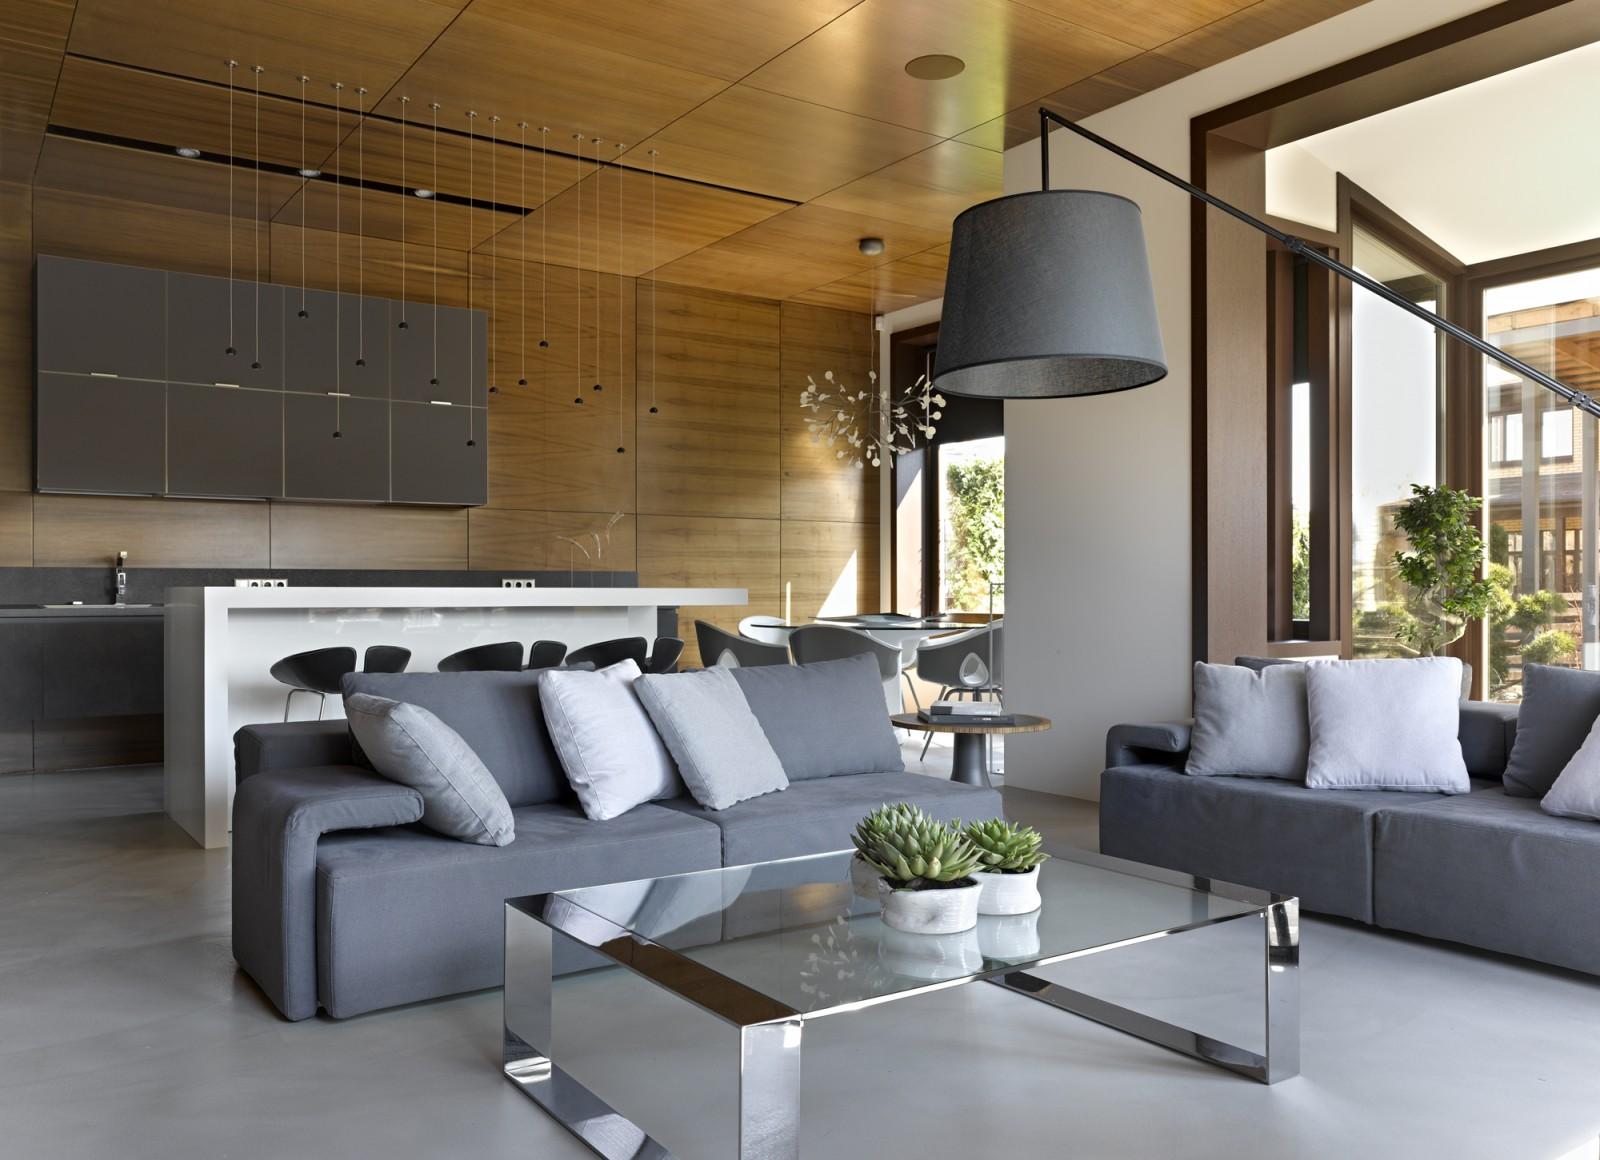 Nice villa interior by architectural Bureau of Alexandra Fedorova - 07